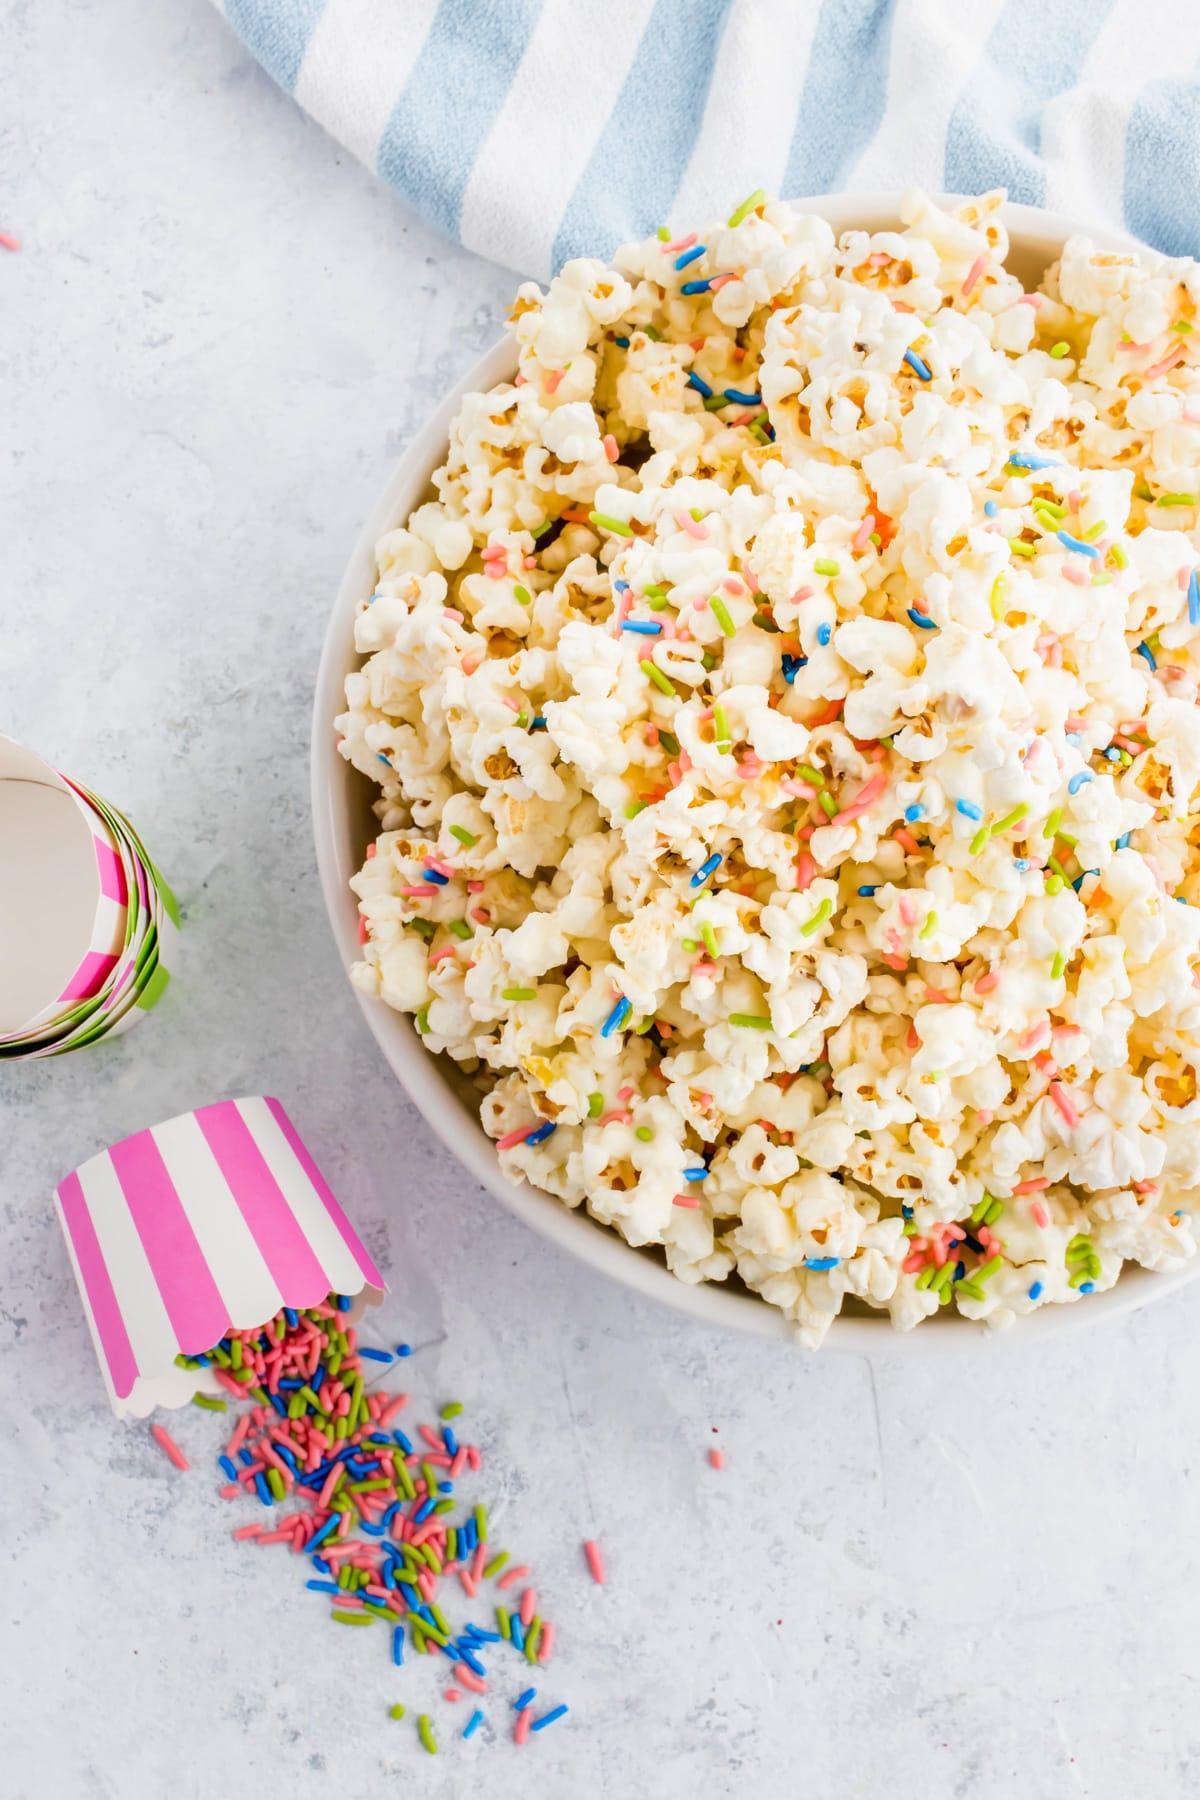 birthday white chocolate funfetti popcorn by top Houston lifesyle blogger Ashley Rose of Sugar and Cloth #recipes #entertaining #idea